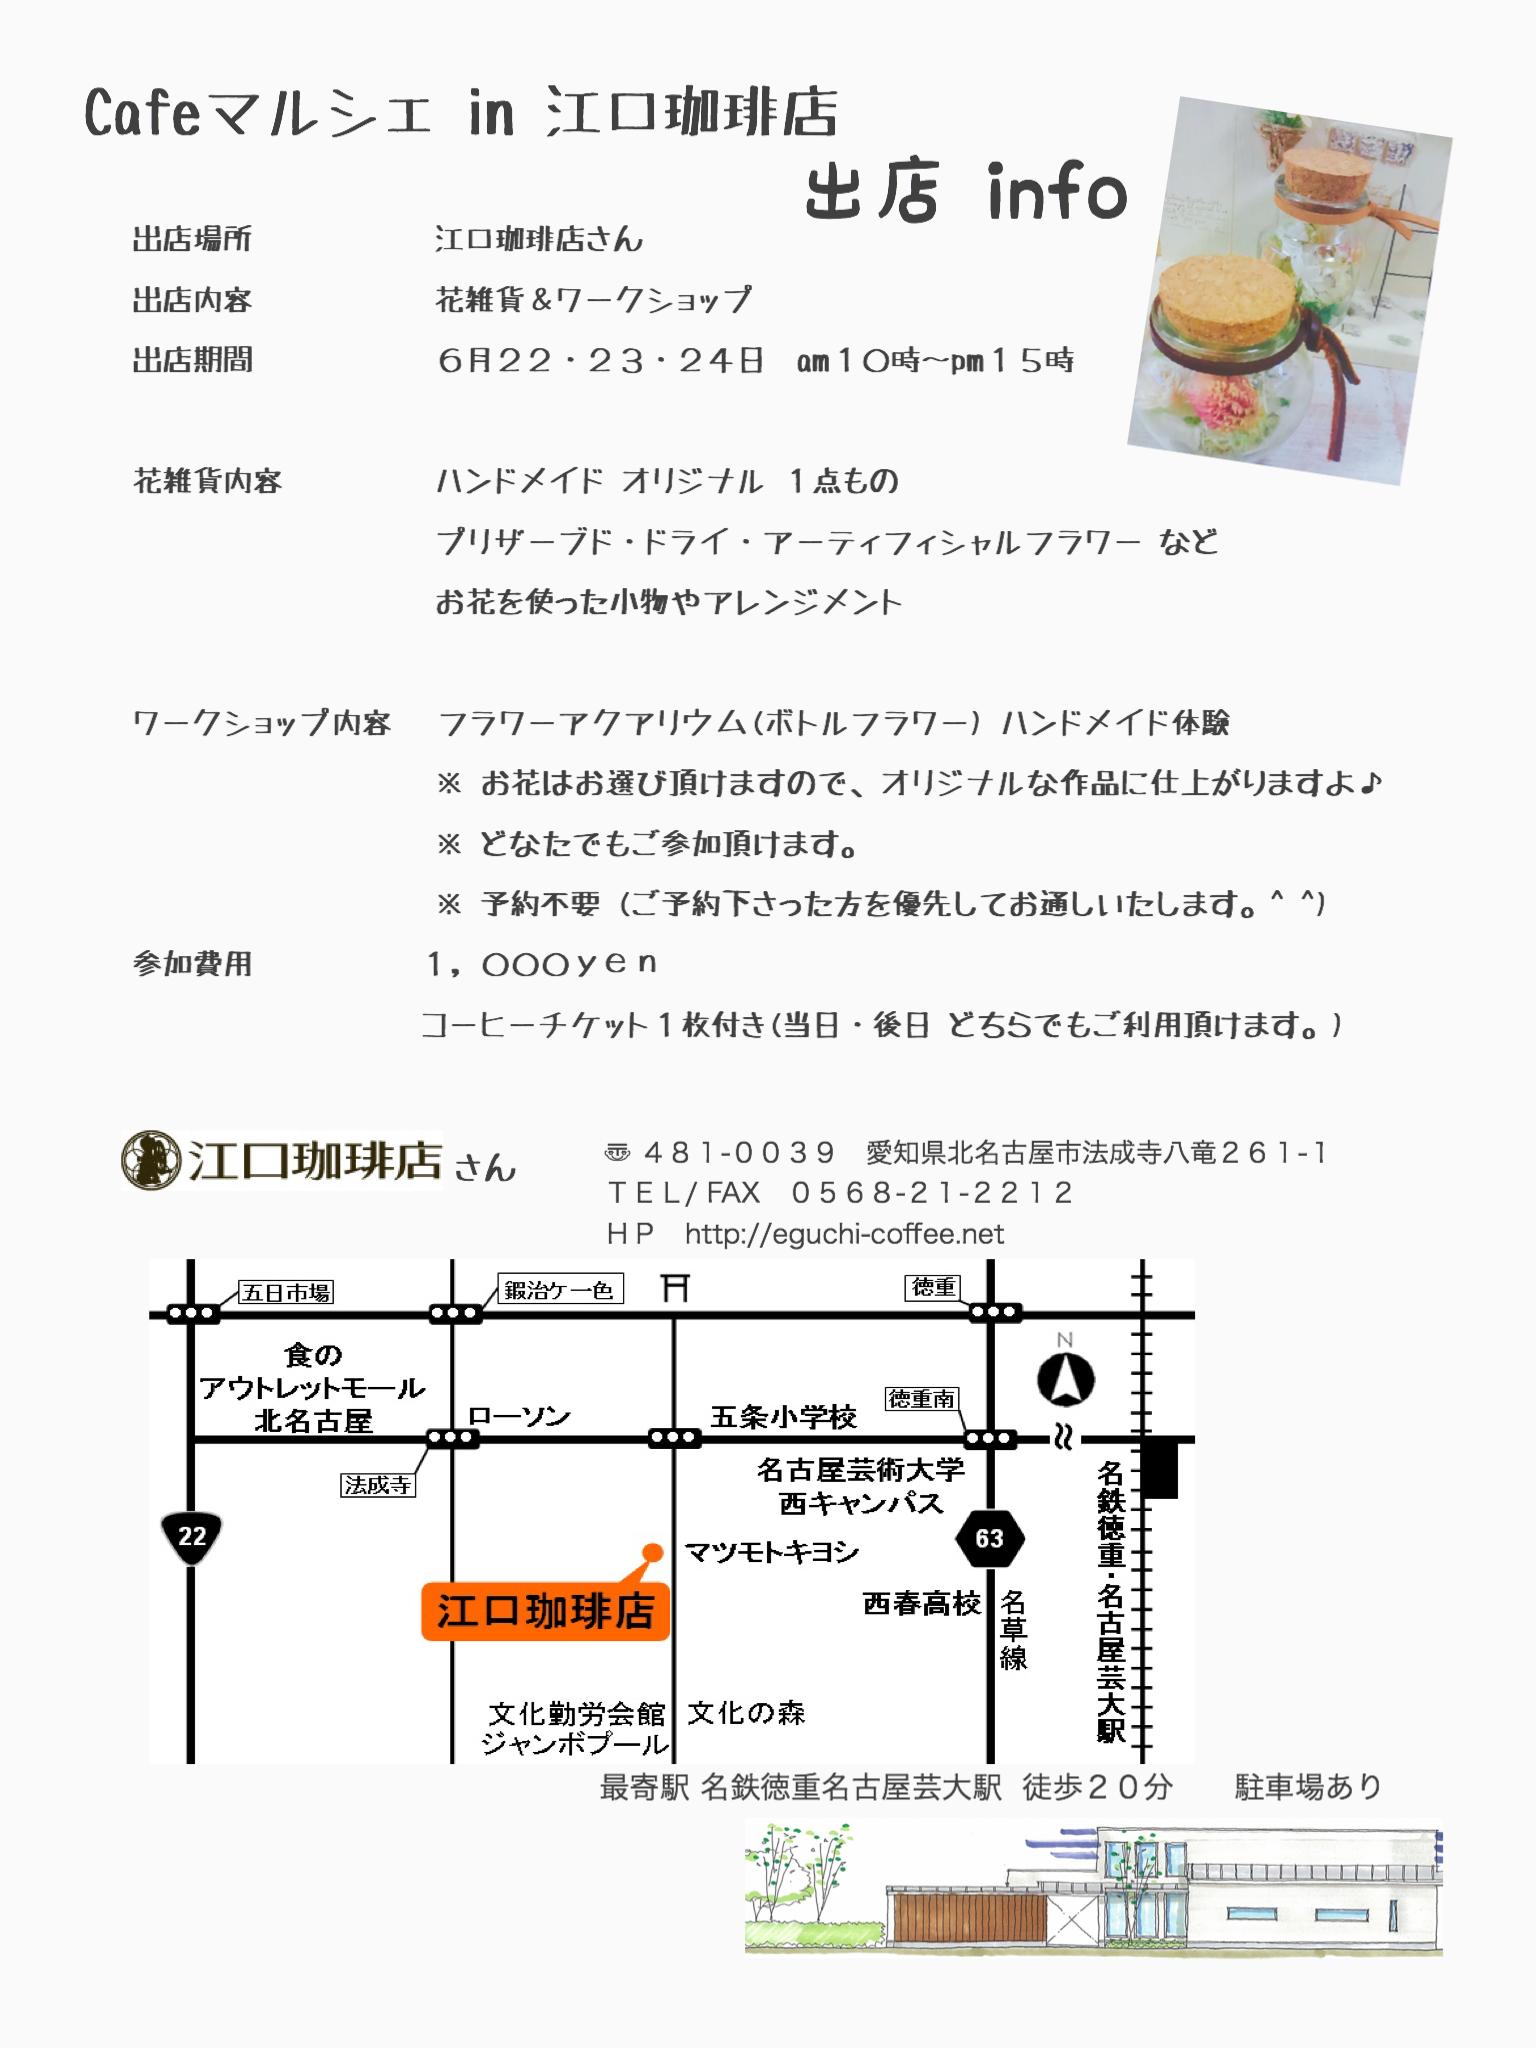 Cafeマルシェ in 江口珈琲店 出店info